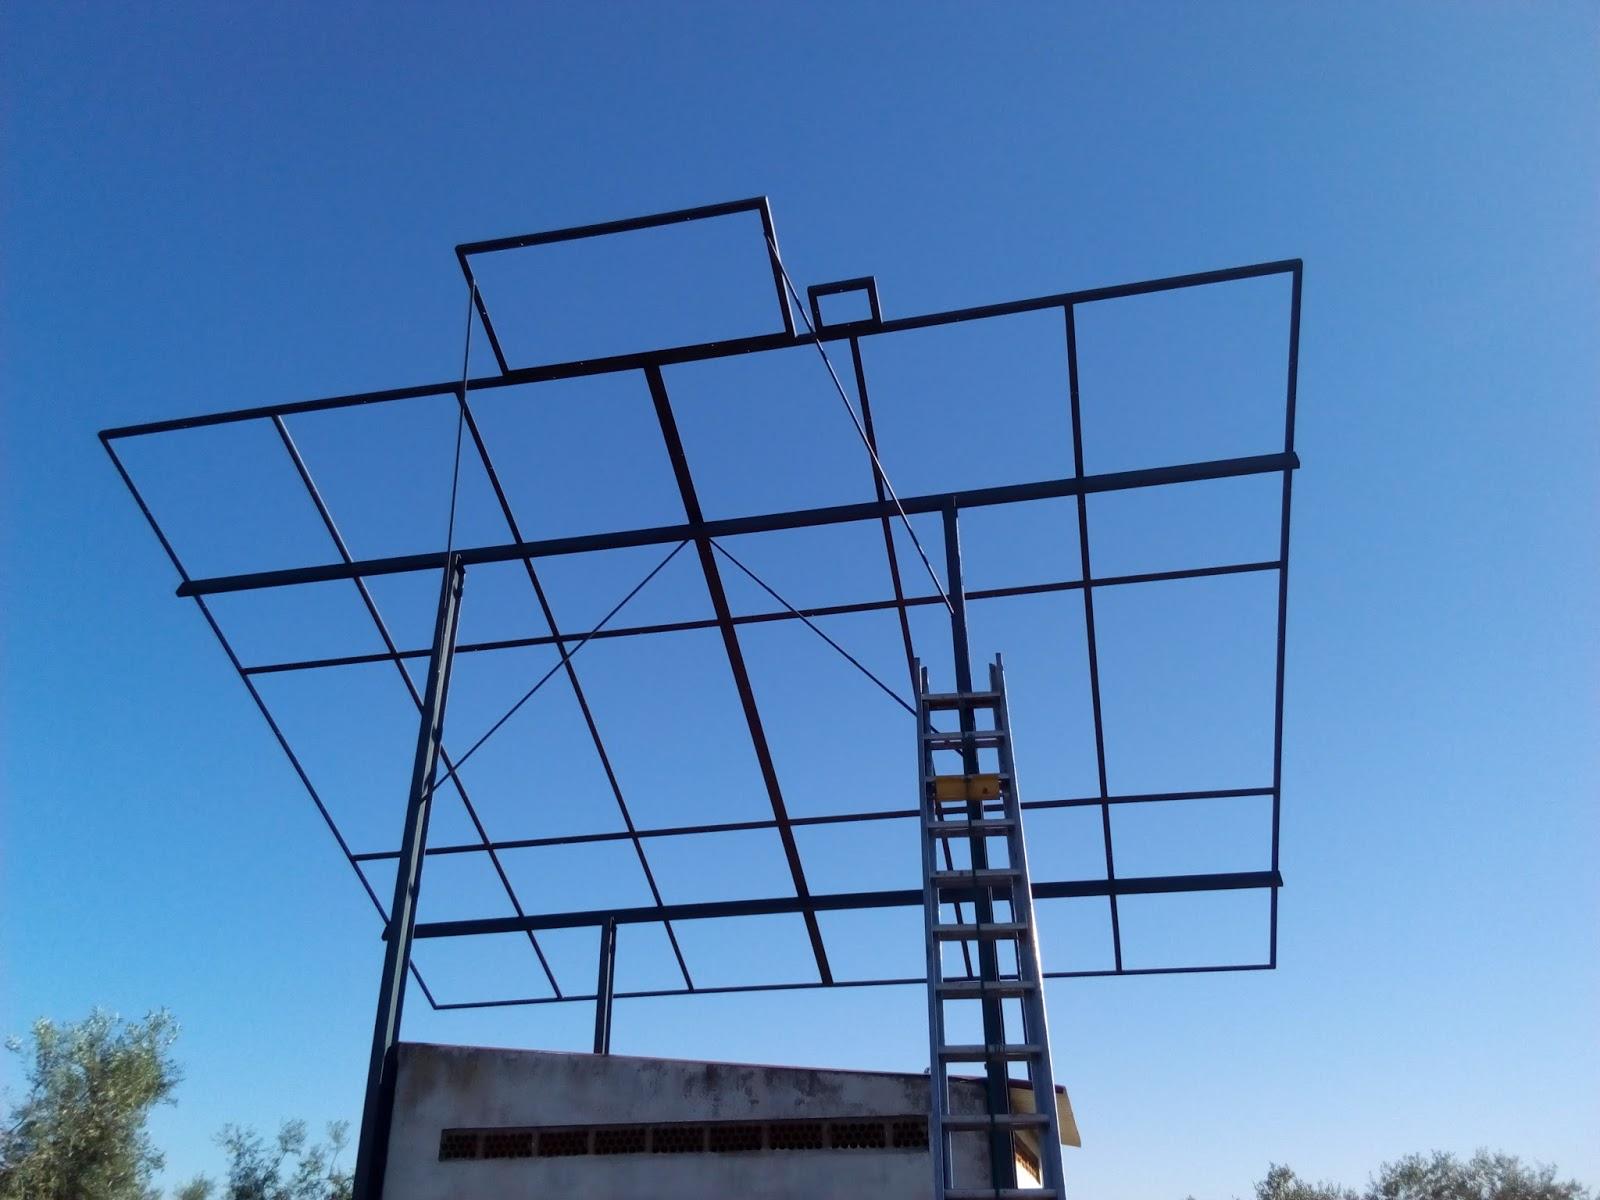 Pizarro Guareña (Badajoz): EXTRUCTURA PARA PLACAS SOLARES